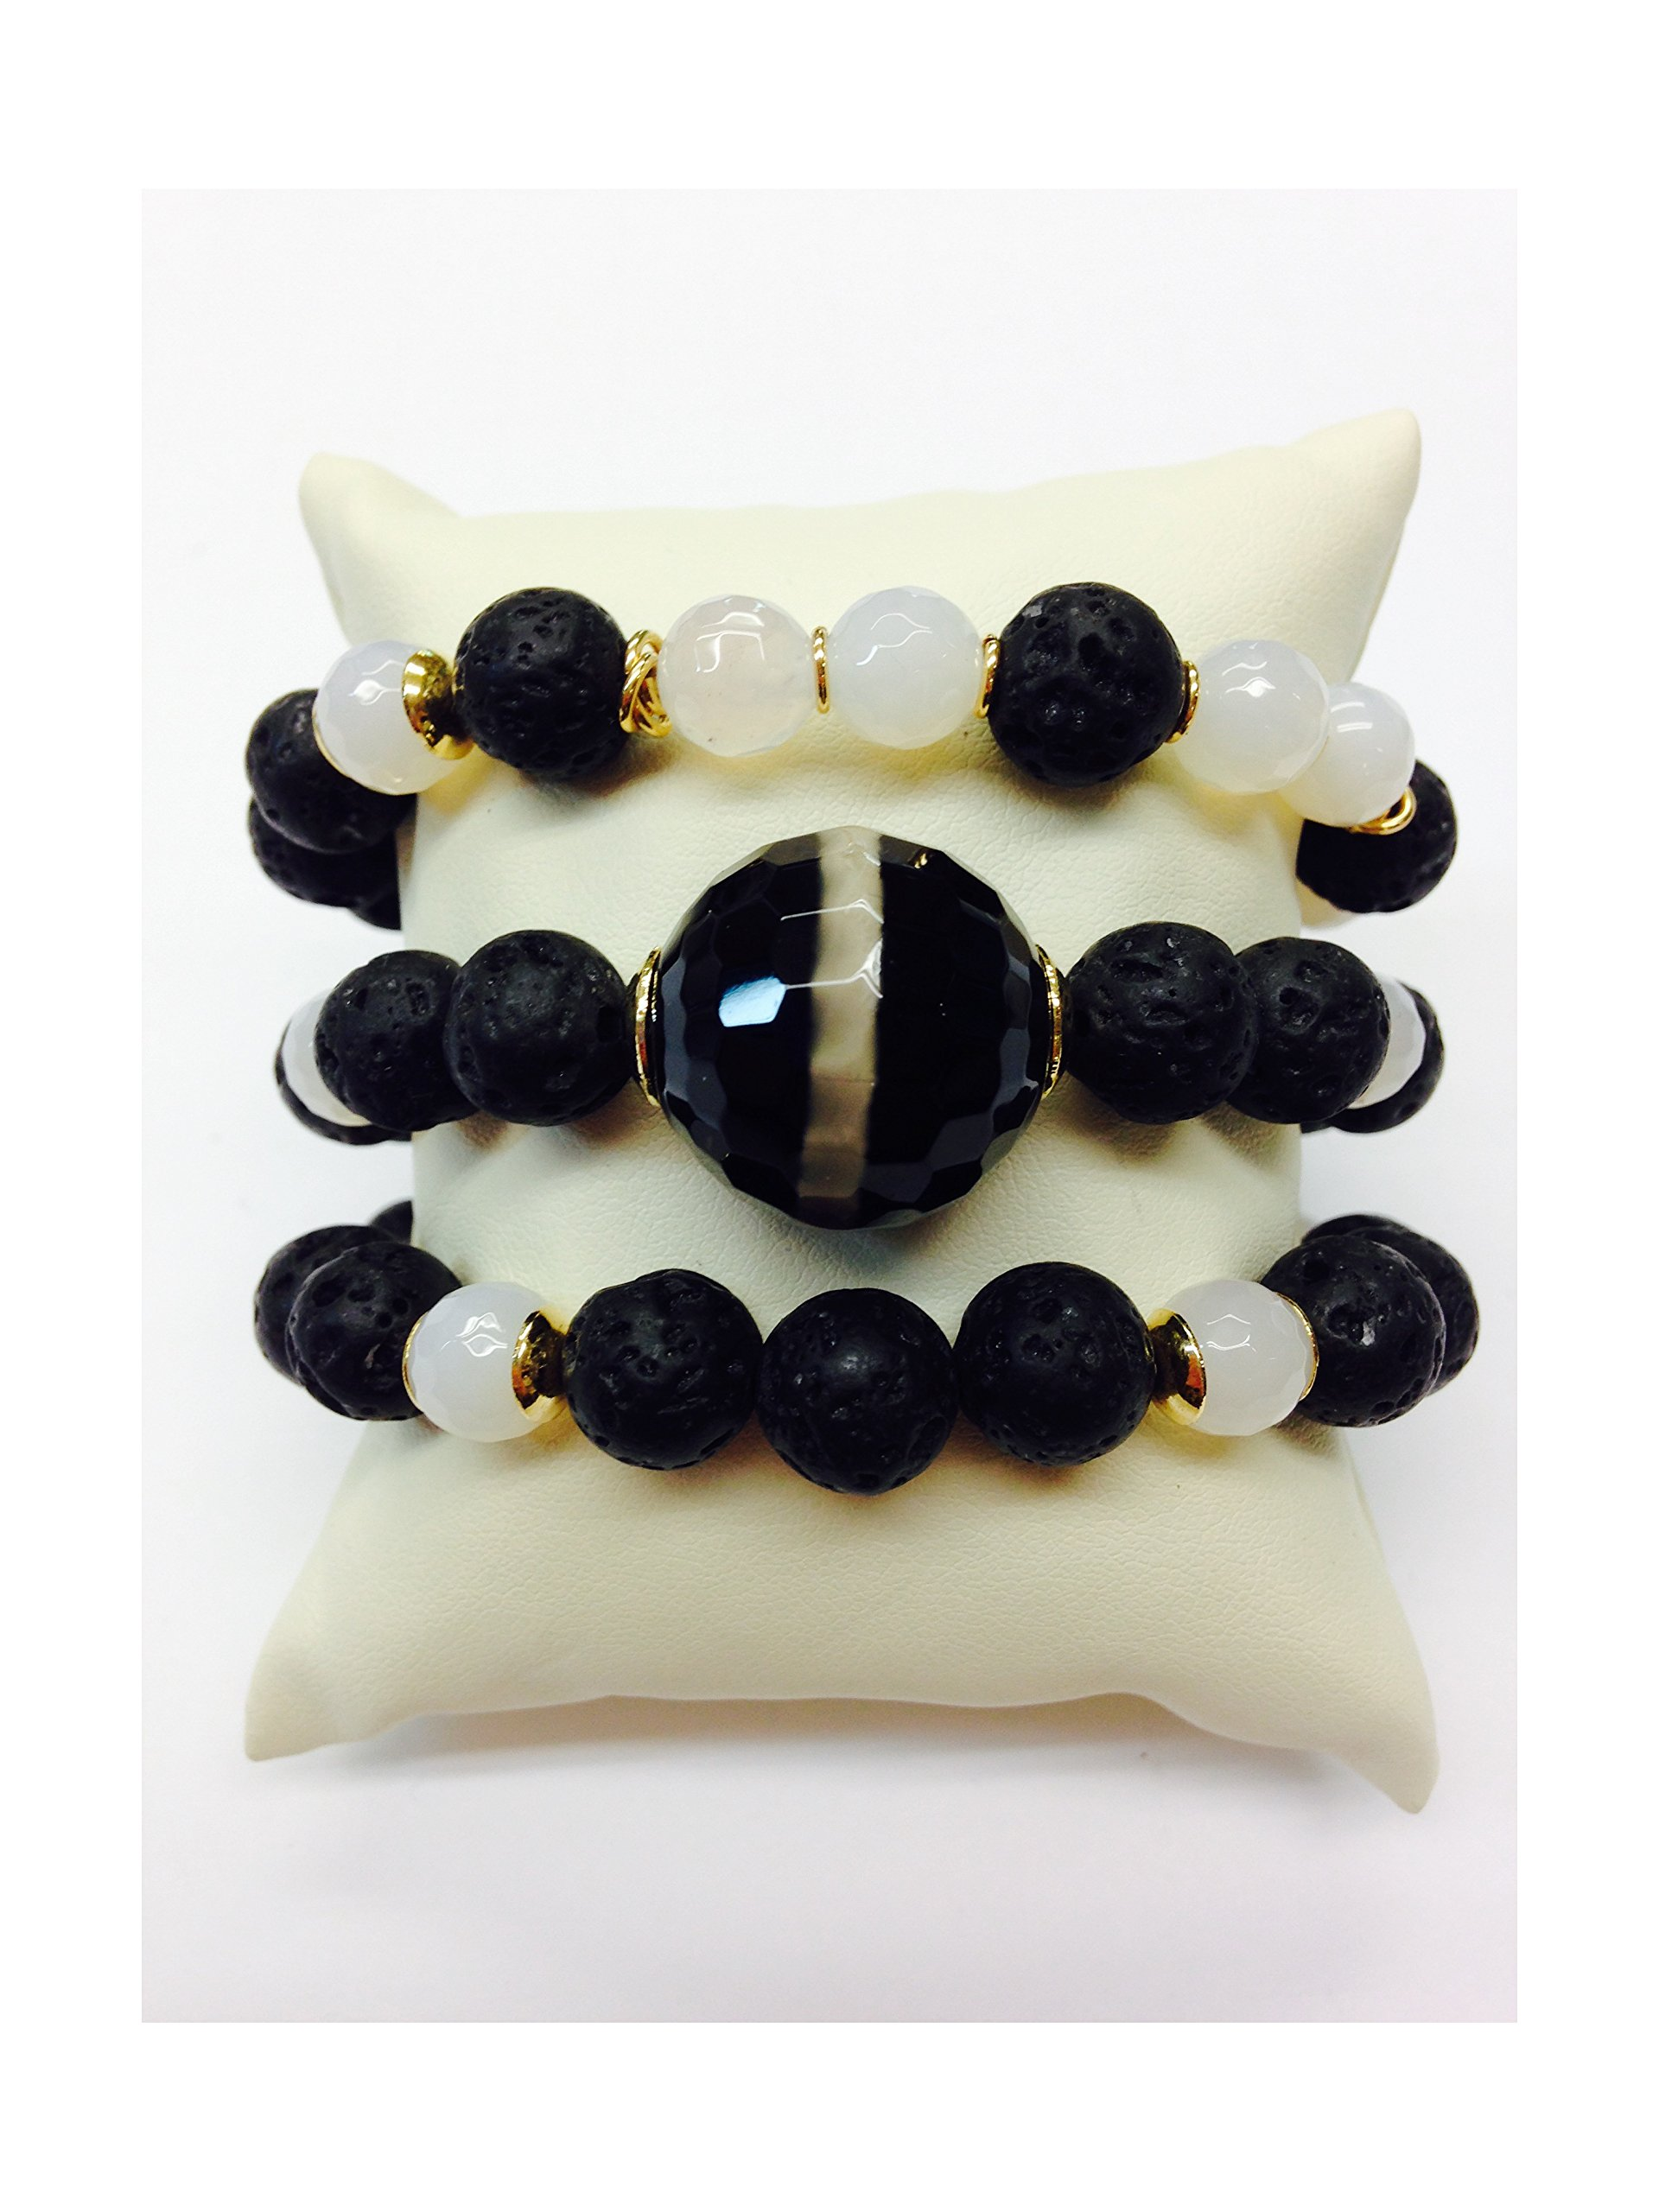 Set of 3 Handmade Bracelets - Volcanic Rock, White Agates, Rare Giant Black & White Tibetan Agate Natural Stones & Goldfilled Beads by Formula Moda